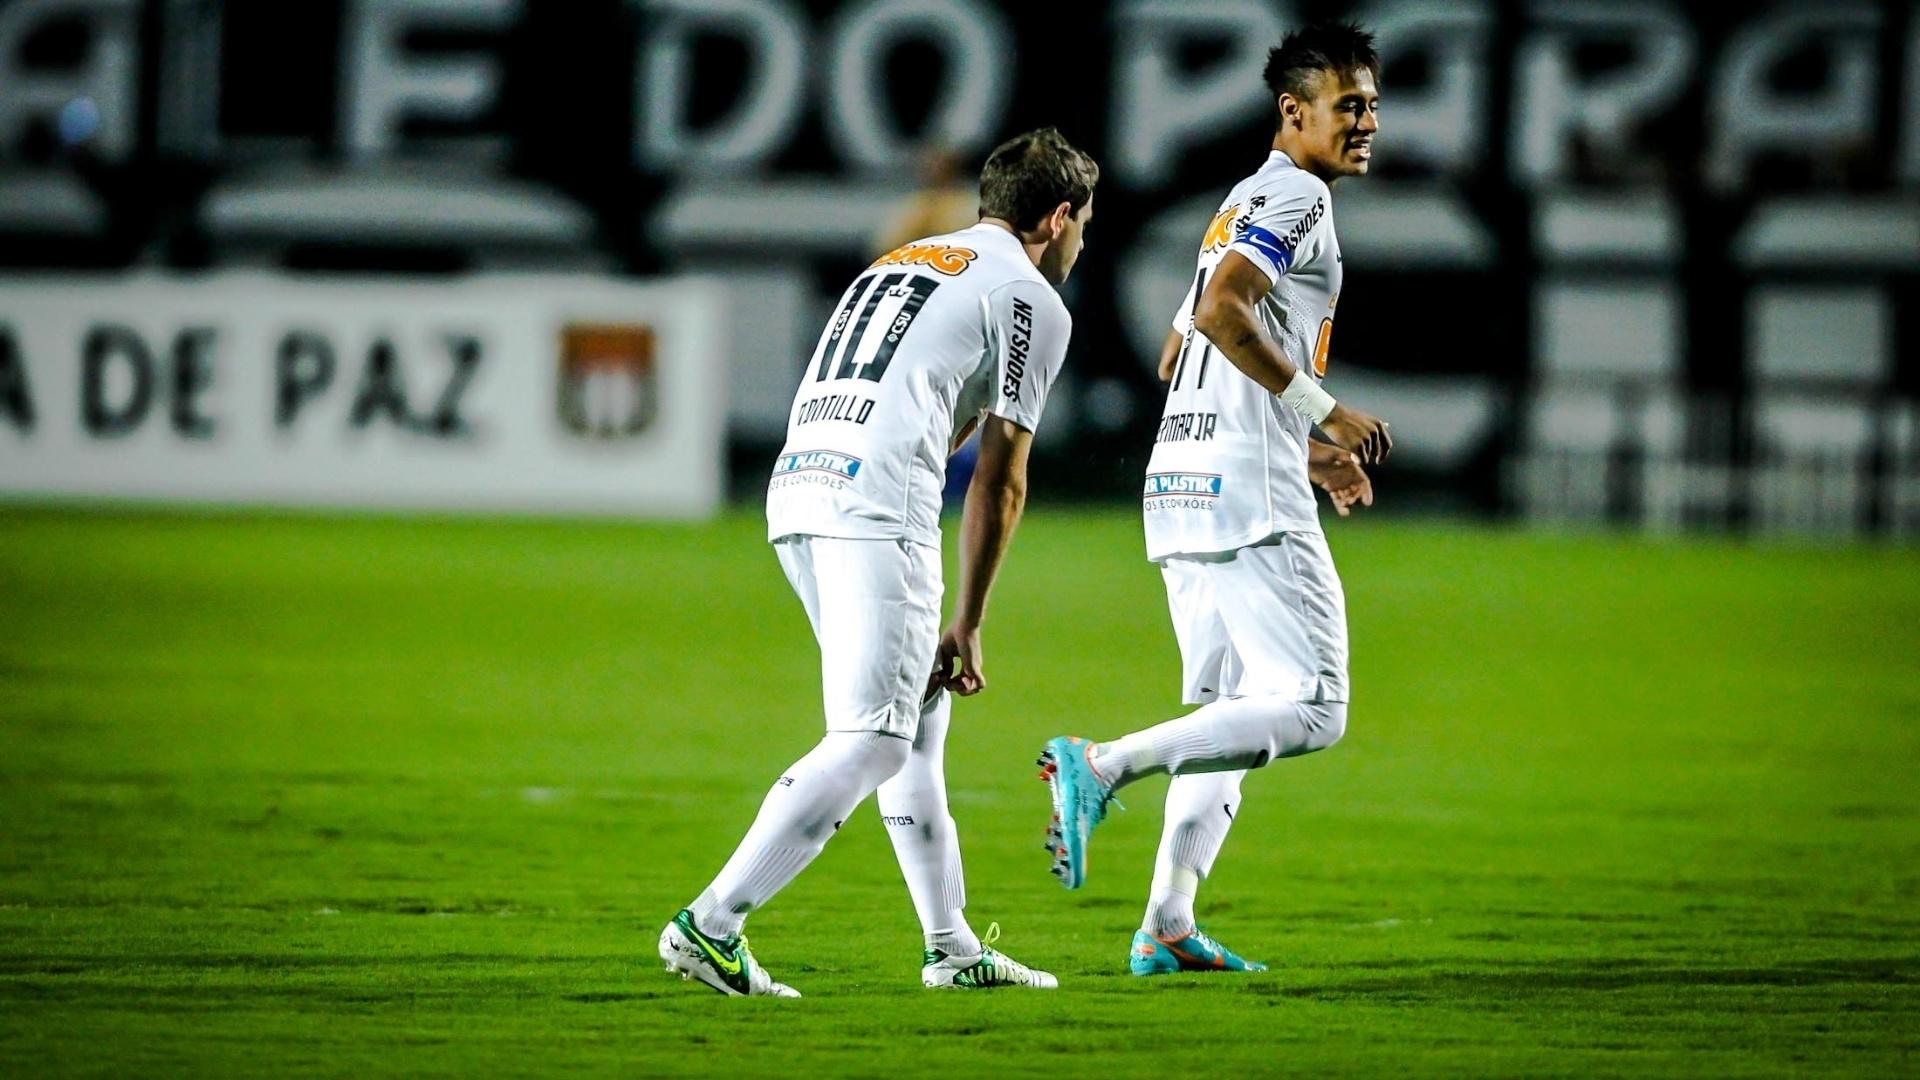 16.jan.2013 - Montillo ajeita a meia enquanto Neymar corre antes de amistoso entre Santos e Barueri